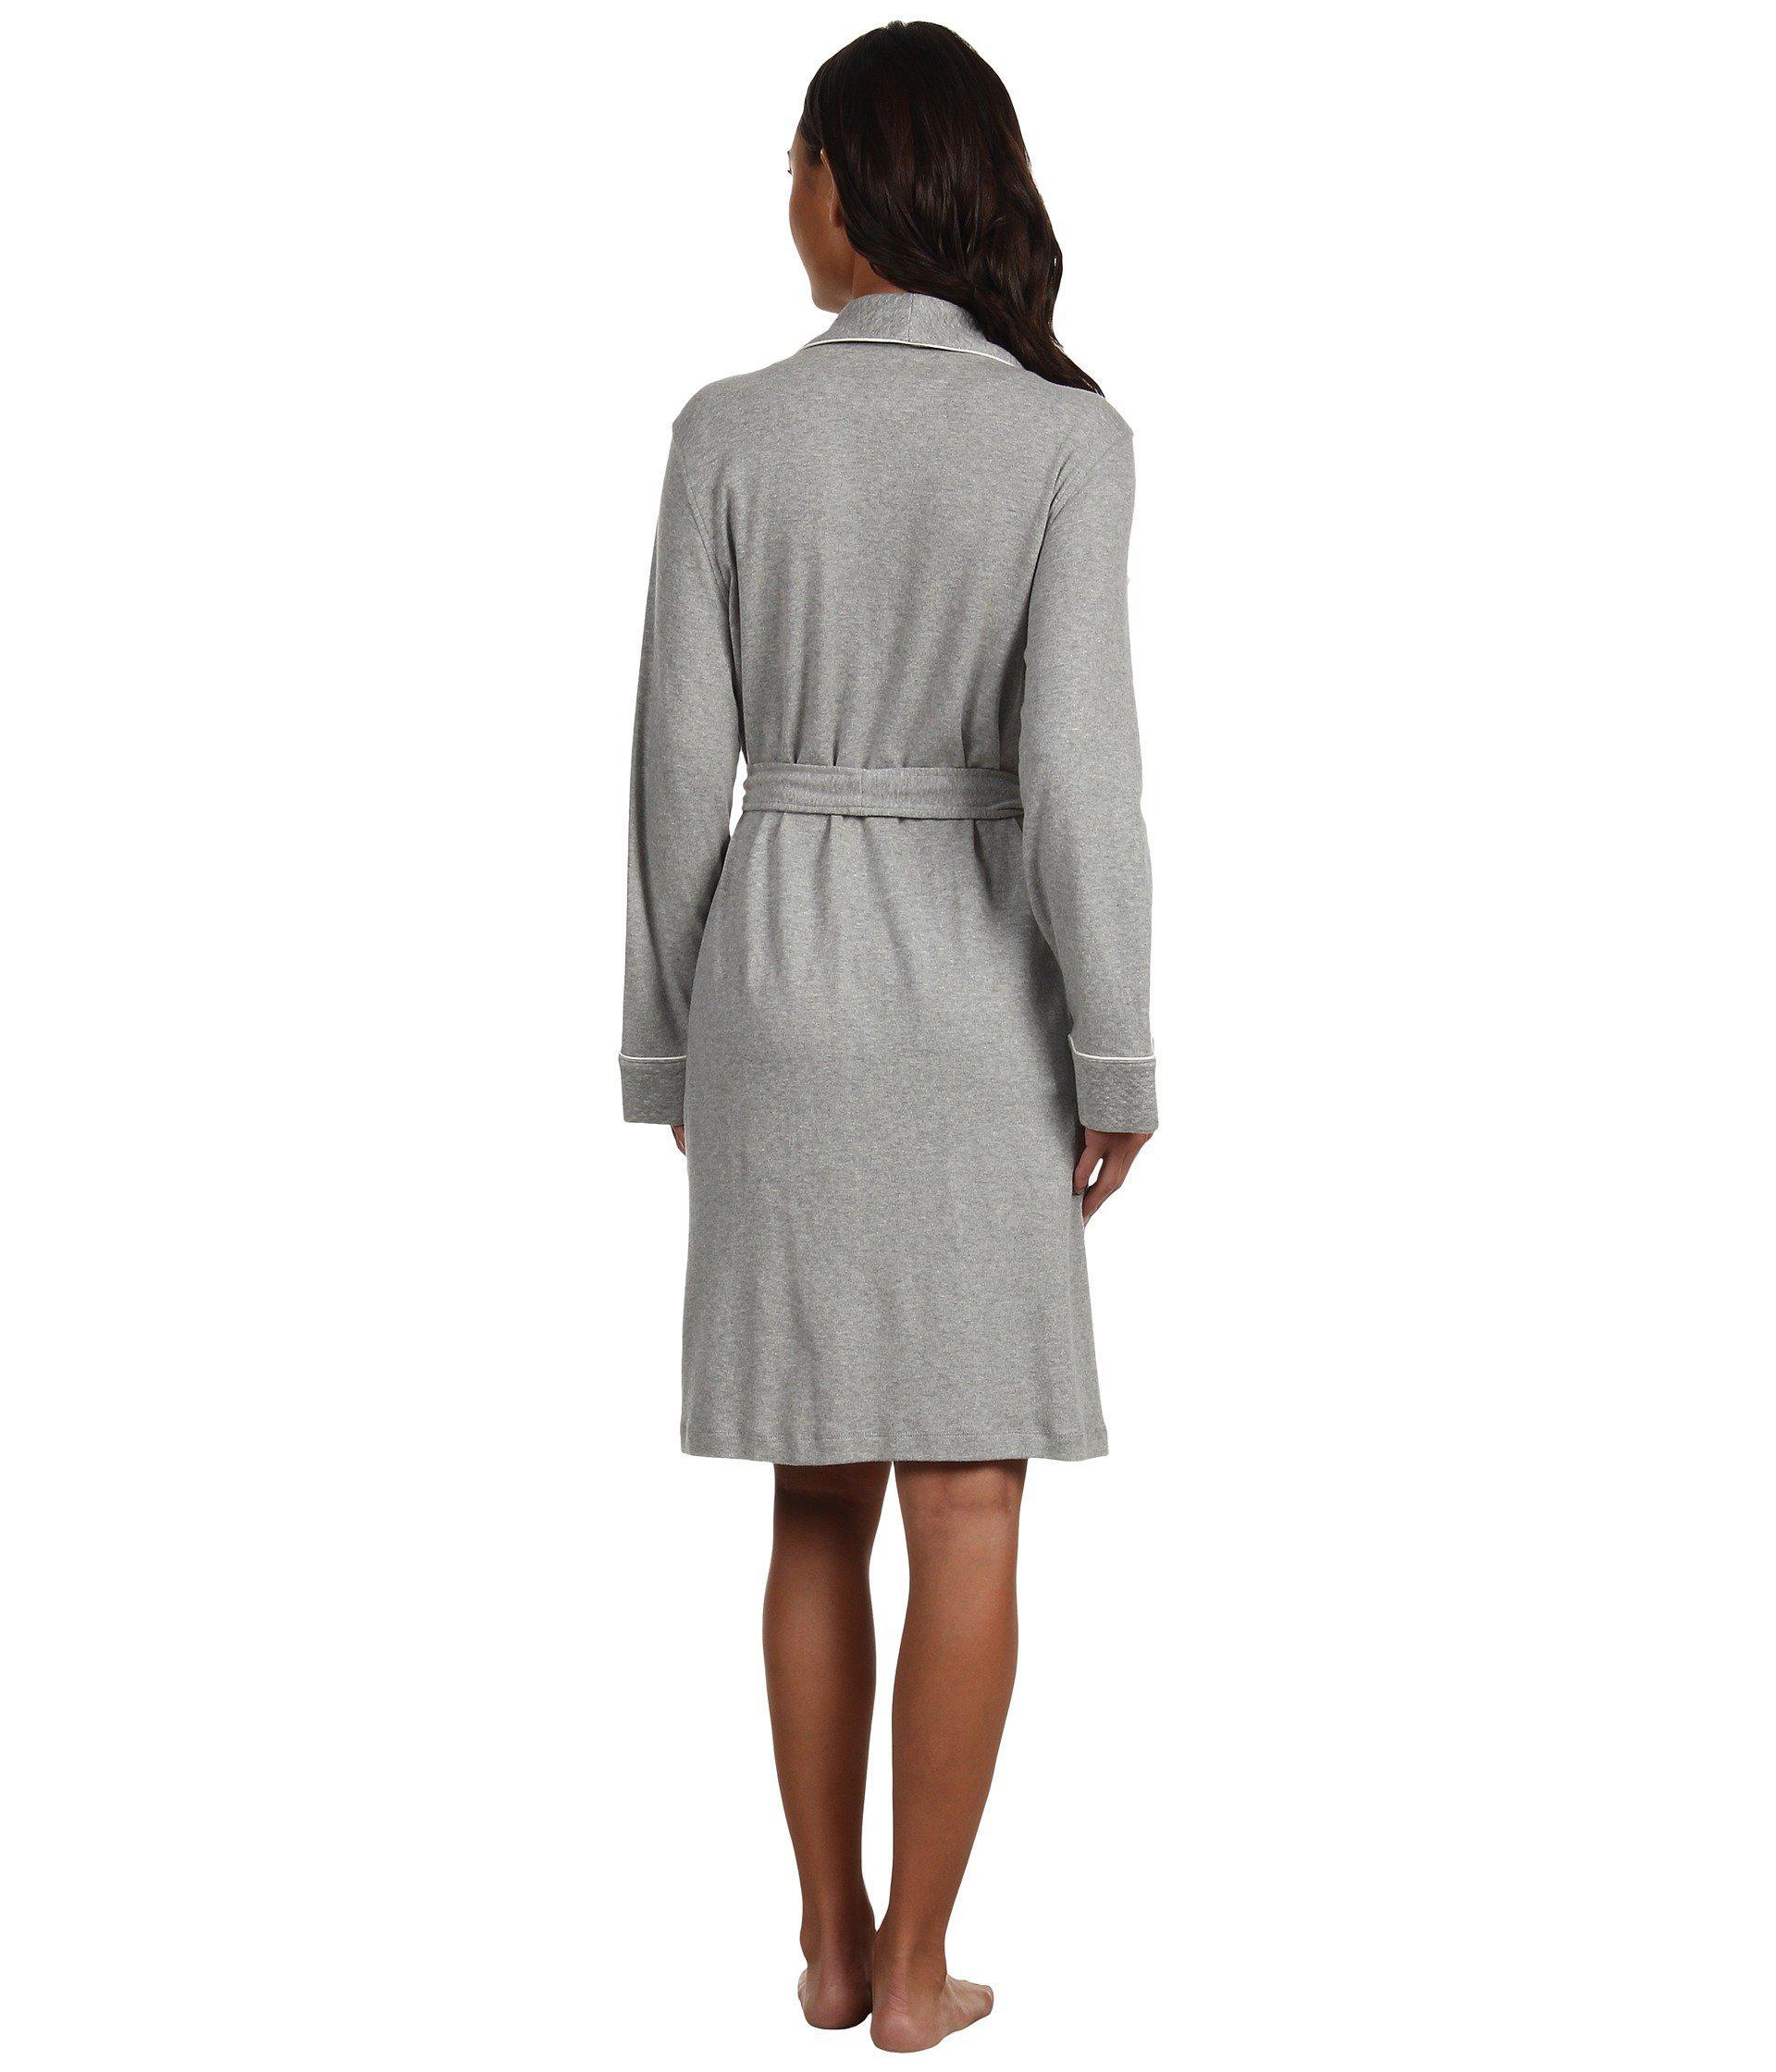 Lauren by Ralph Lauren Essentials 100/% Cotton Quilted Collar Robe